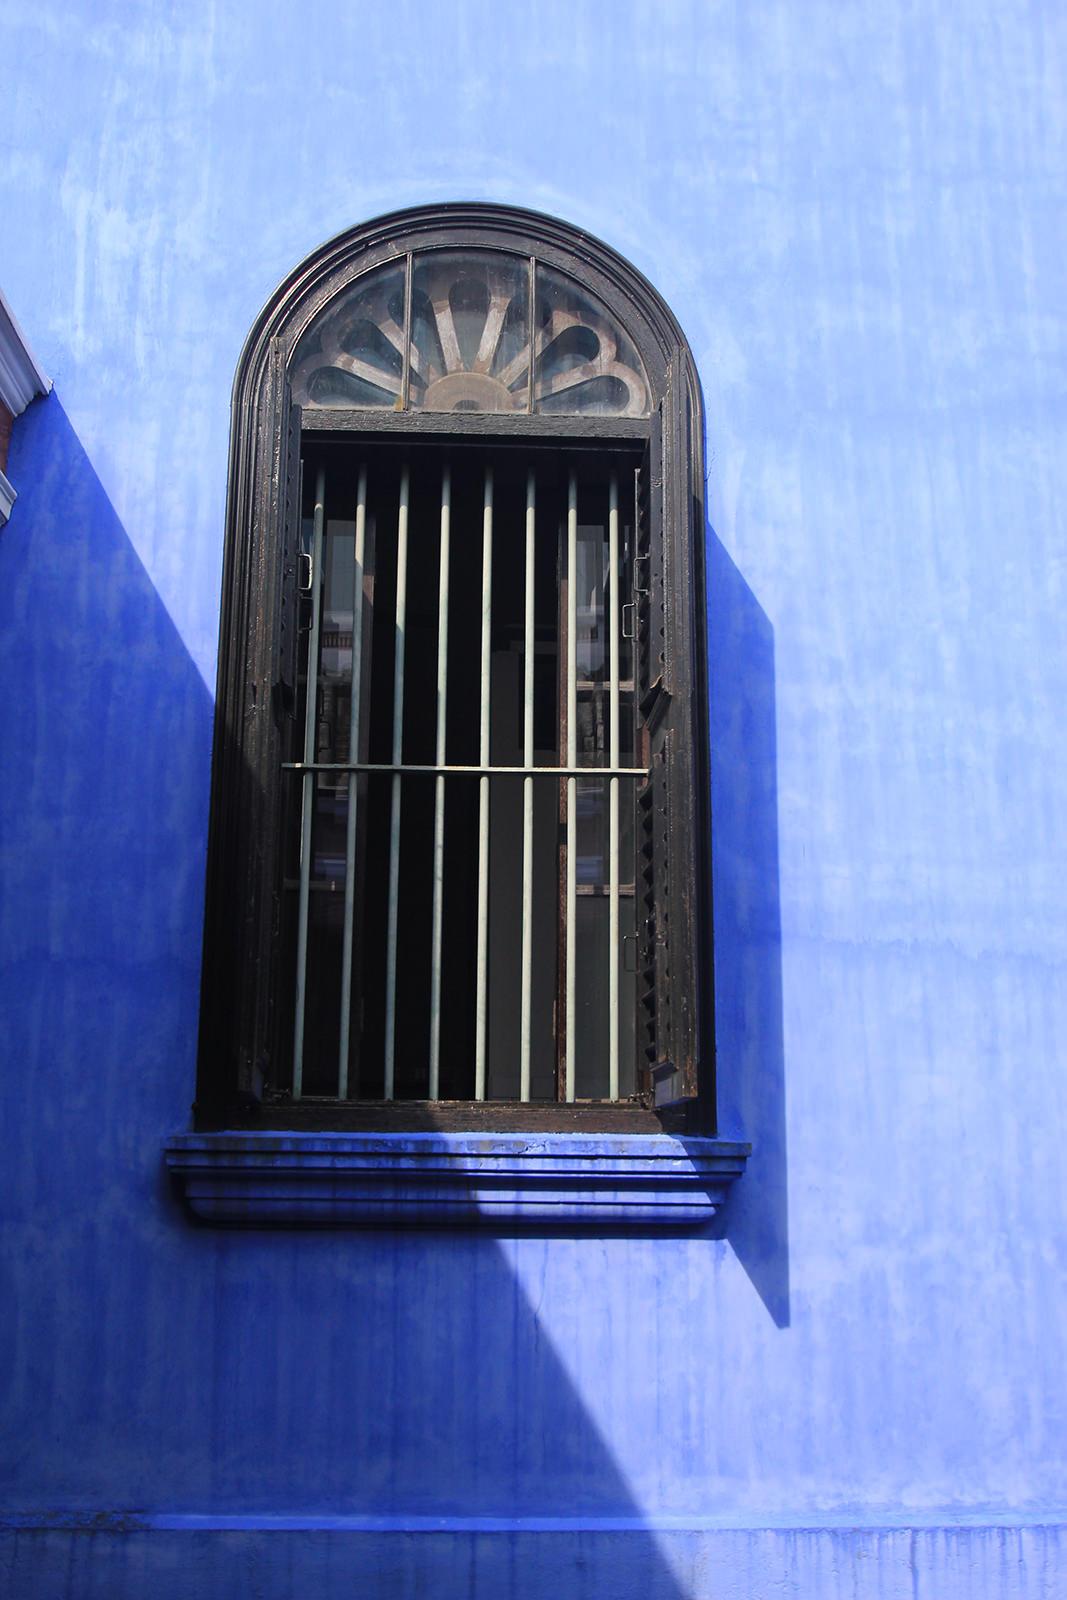 boutique-hotel-penang-island-blue-mansion-architecture-12 Architecture